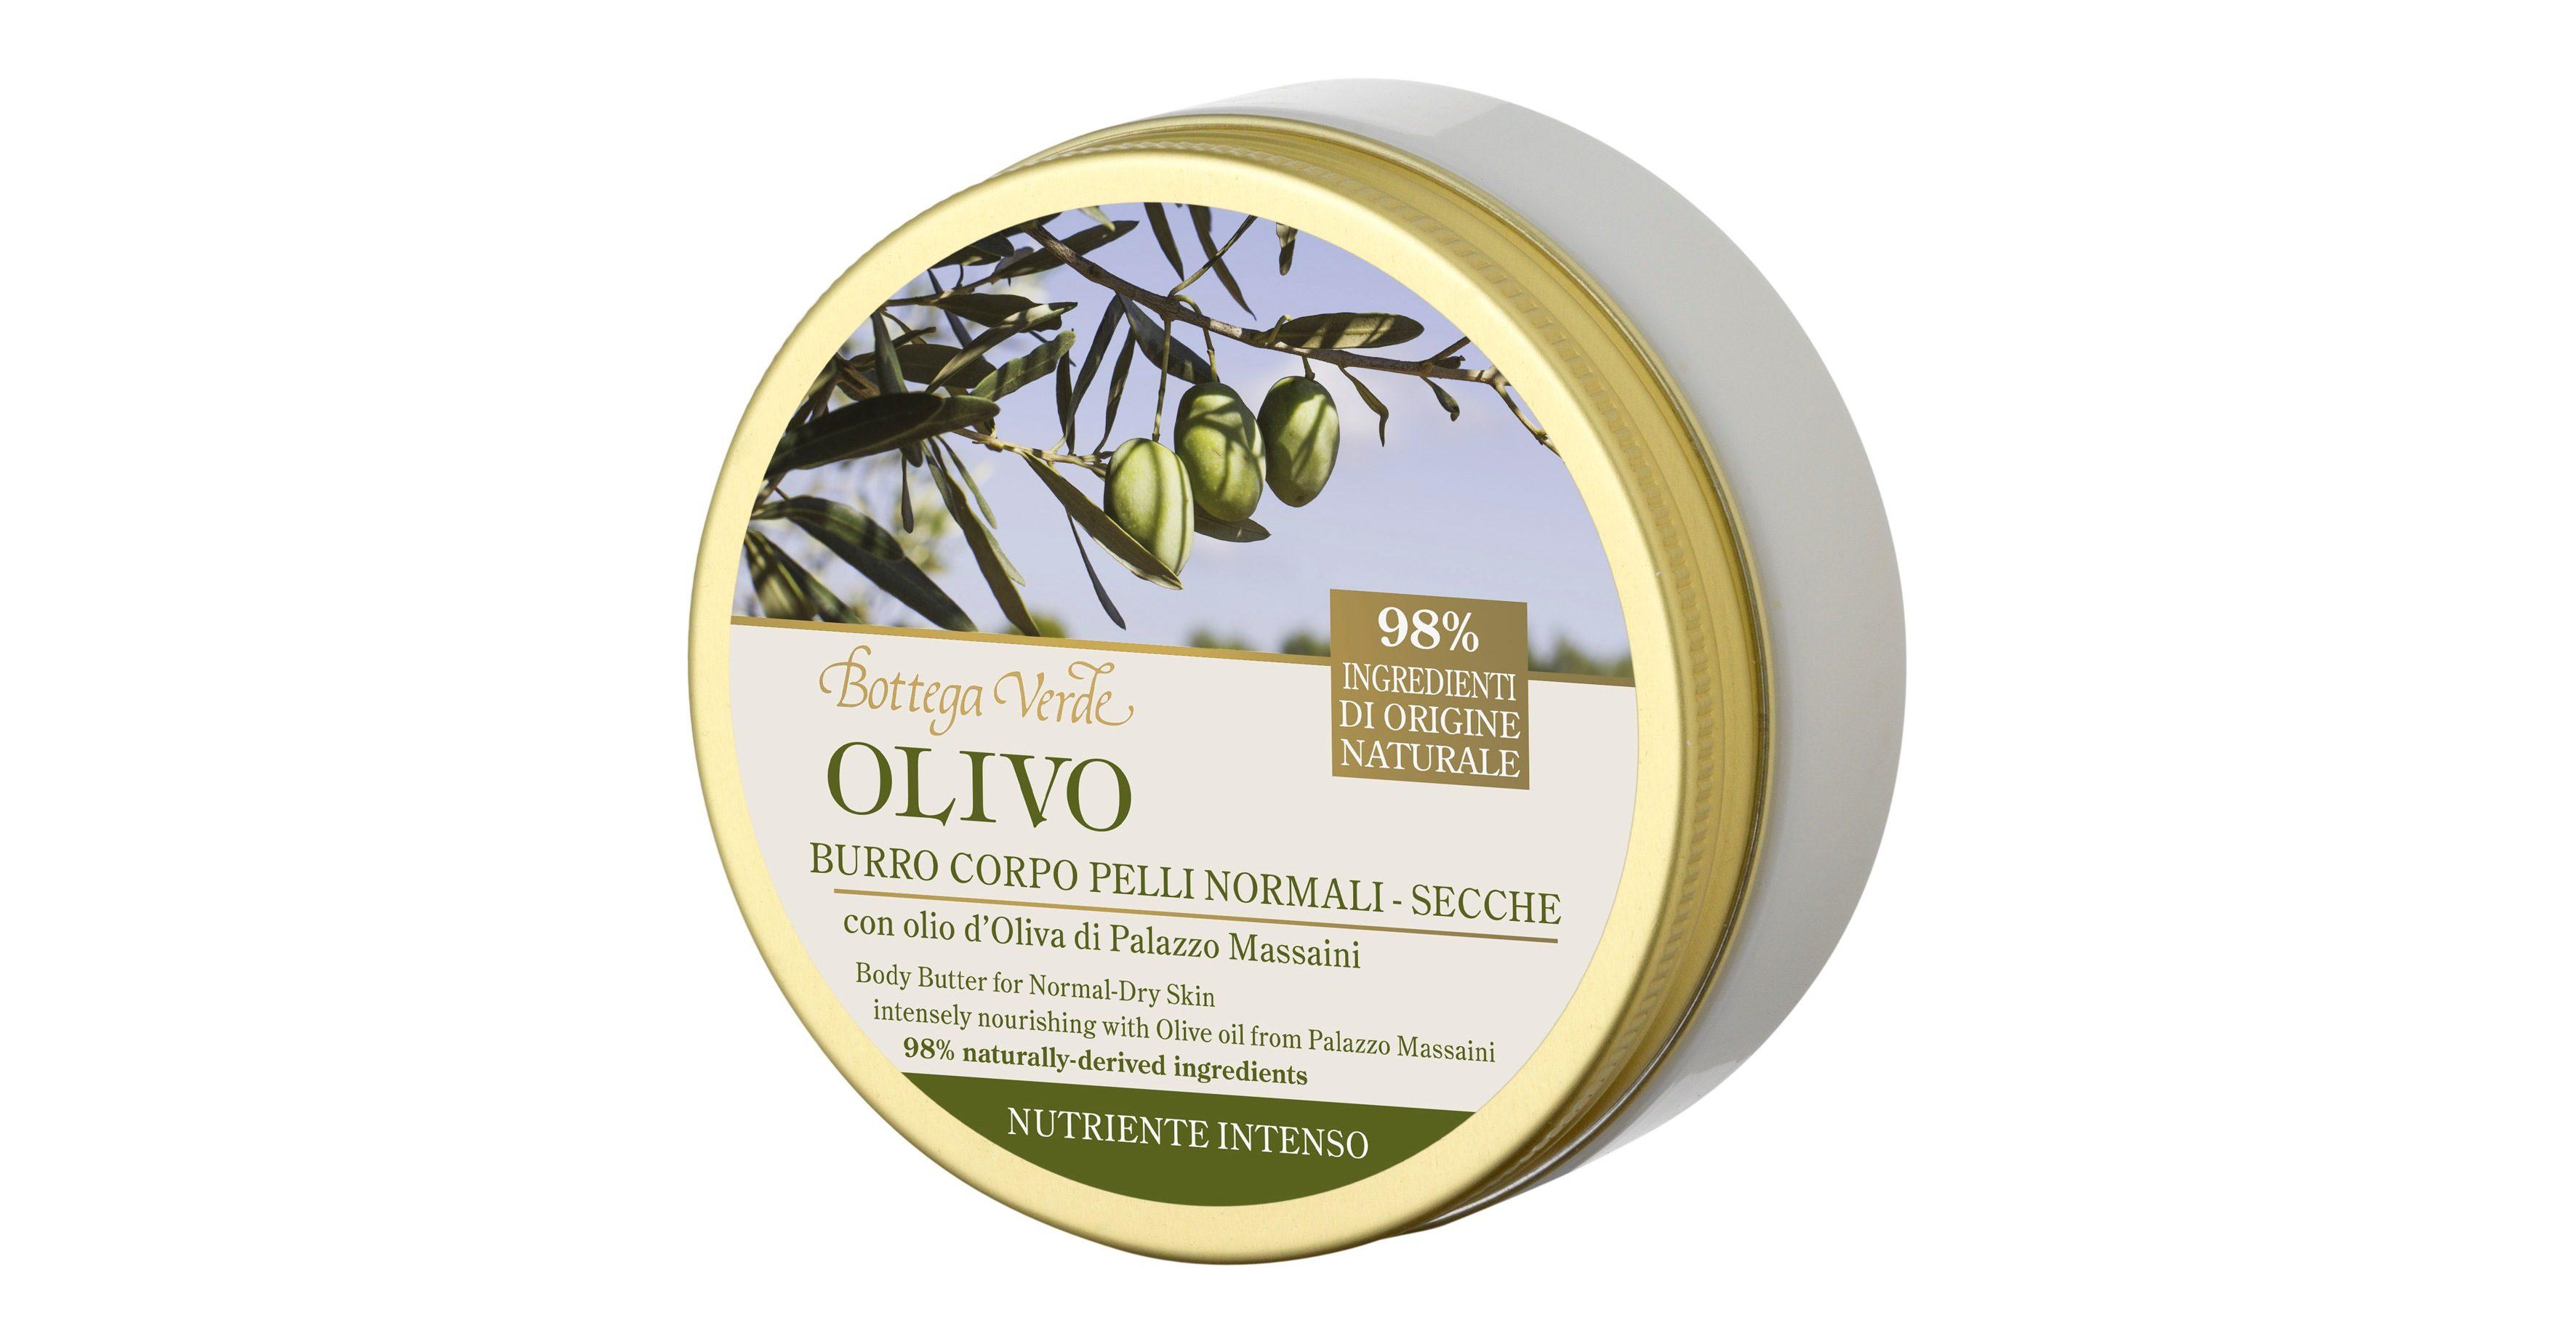 Bottega Verde Linea Olivo Natura Italiana - Burro Corpo